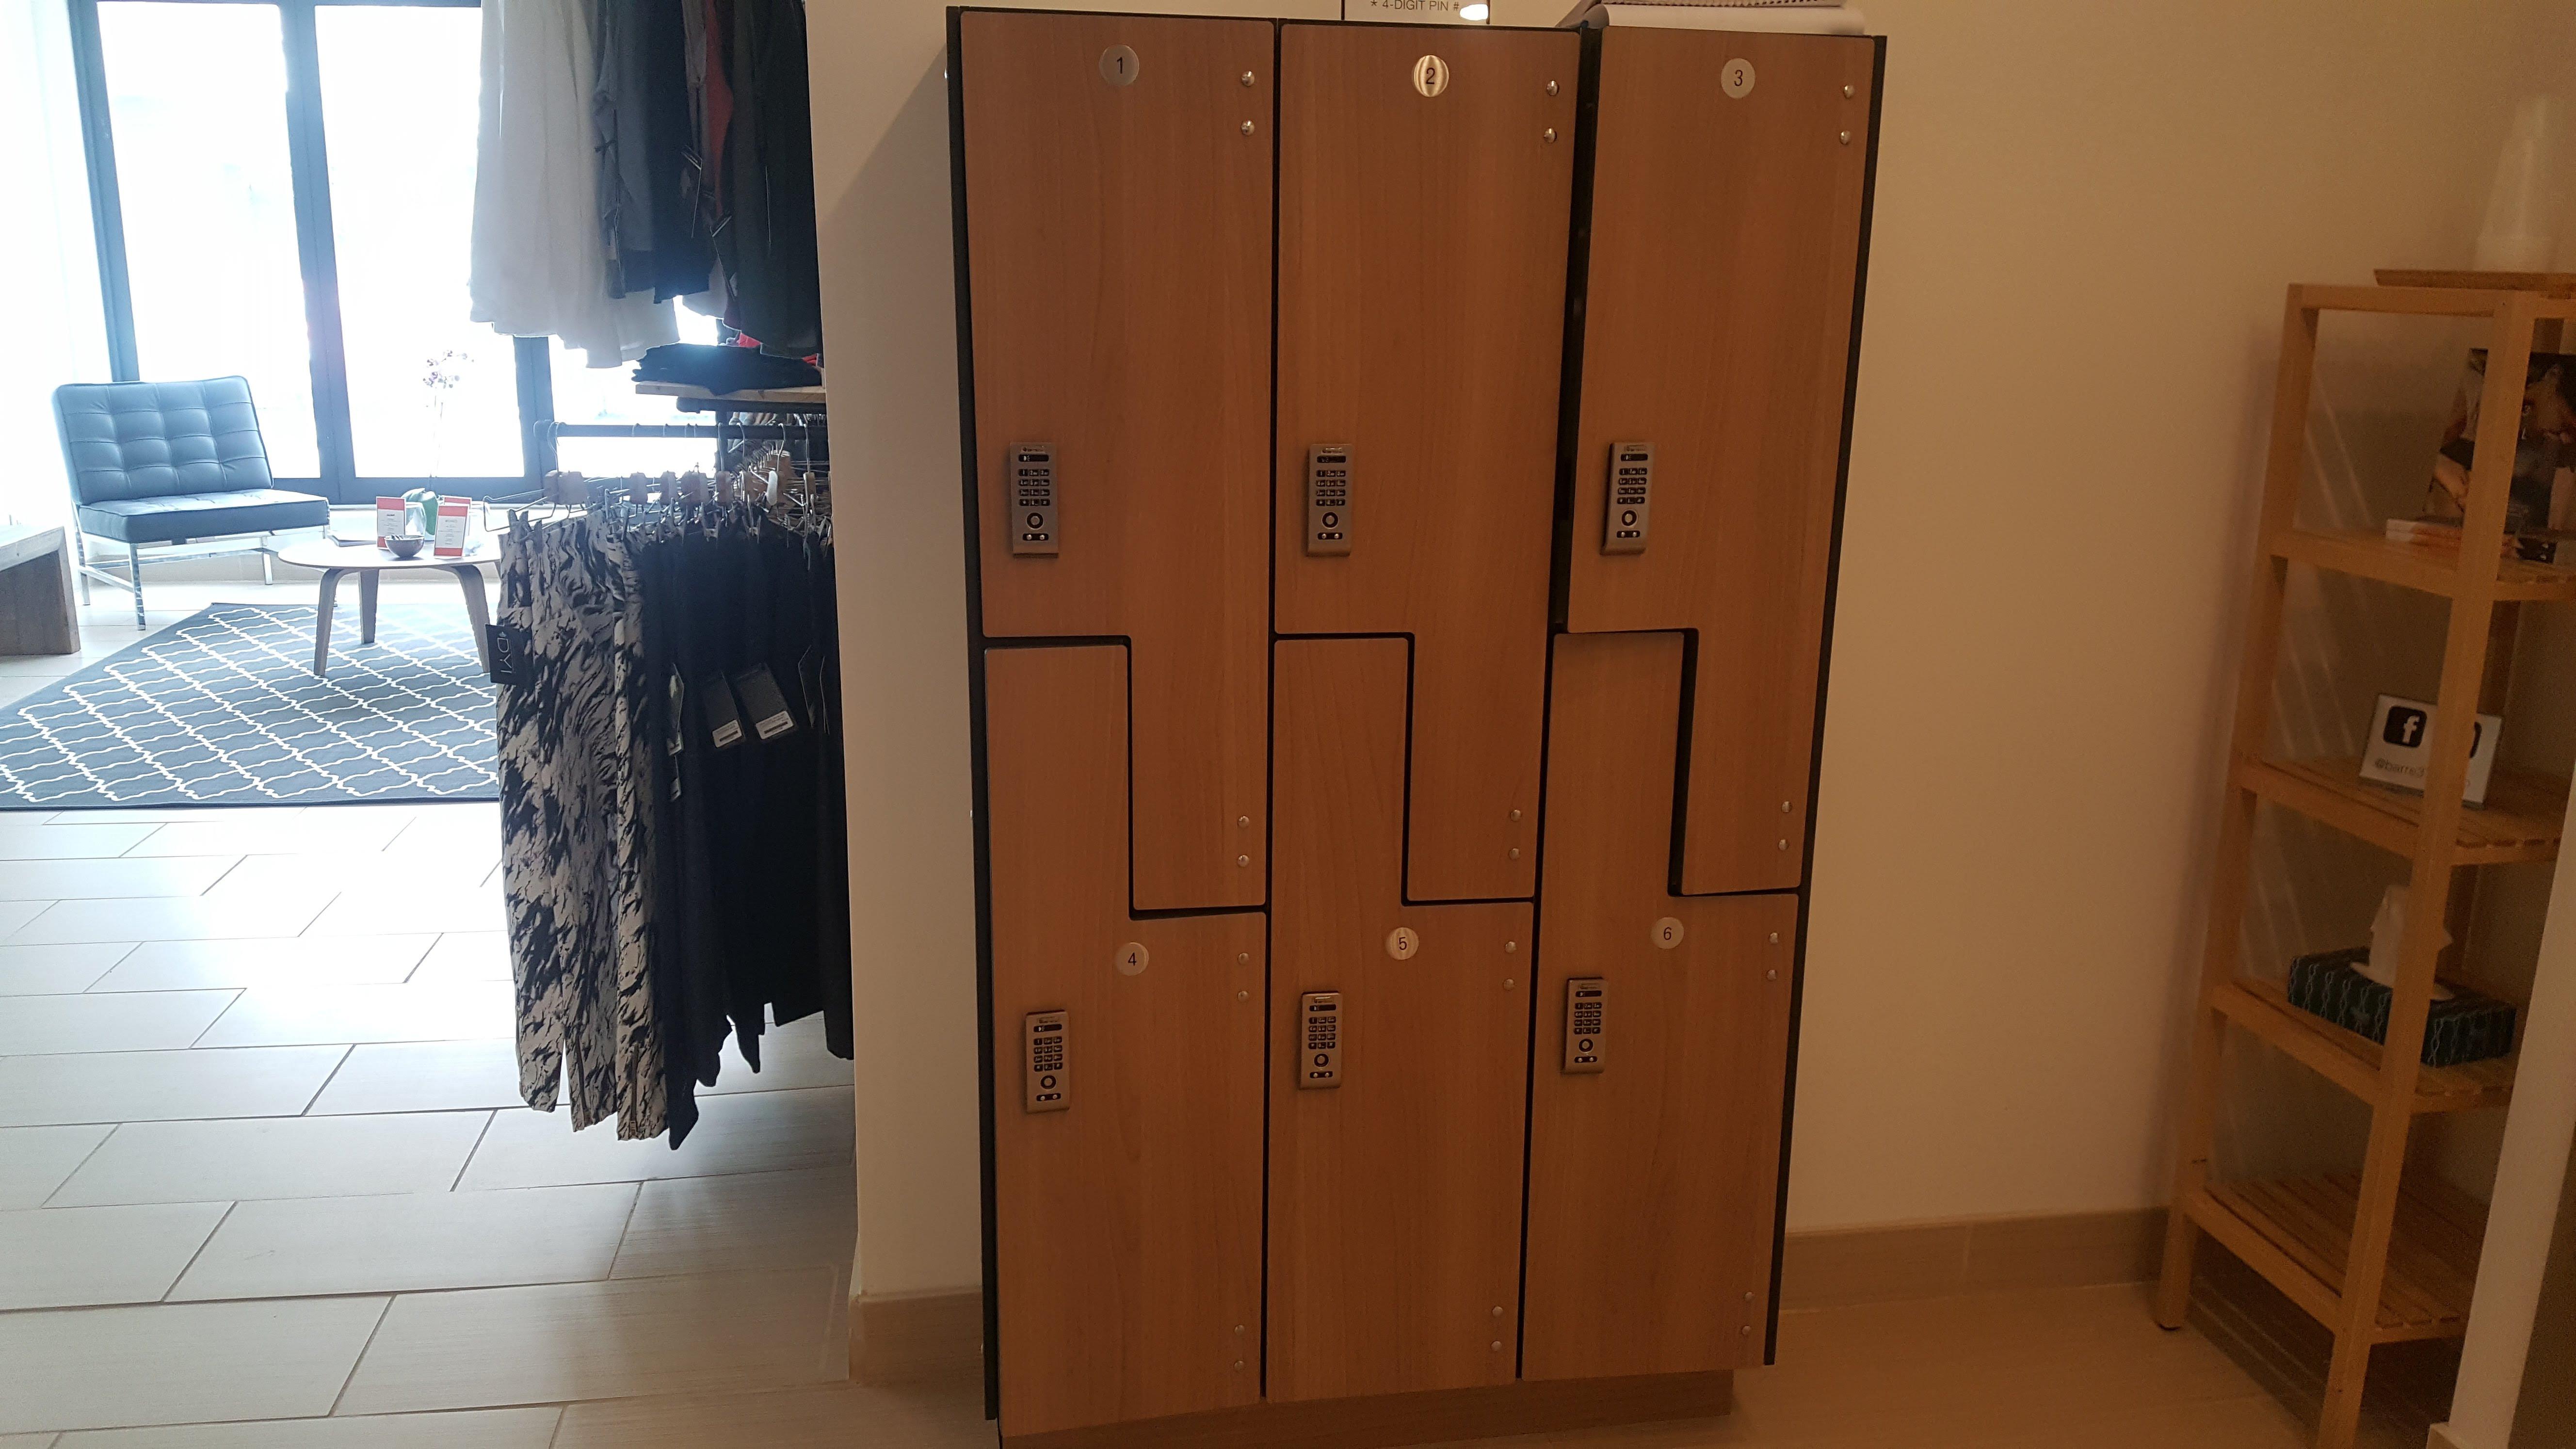 cheap hardwood flooring toronto of aesthetic lockers for barre studio leslieville toronto in project barre3 torontos new leslieville studio